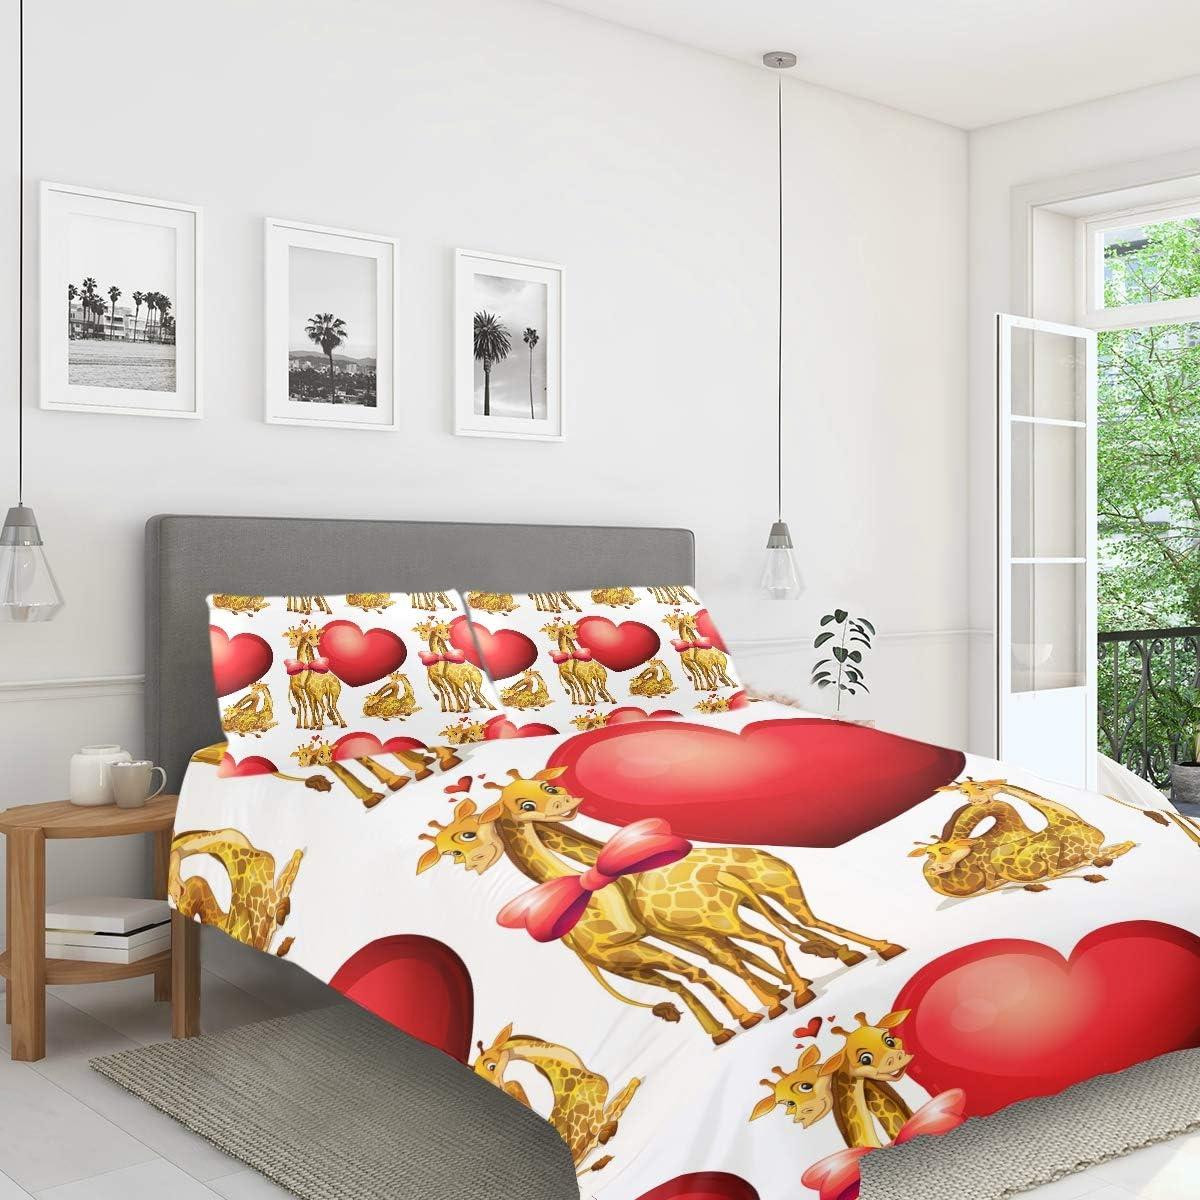 Amazon Com Fcz 3 Pieces Kids Peach Skin Velvet Duvet Cover Set Giraffes With Giant Hearts Bedding Sets For Girls Boys Children Teens Twin Home Kitchen